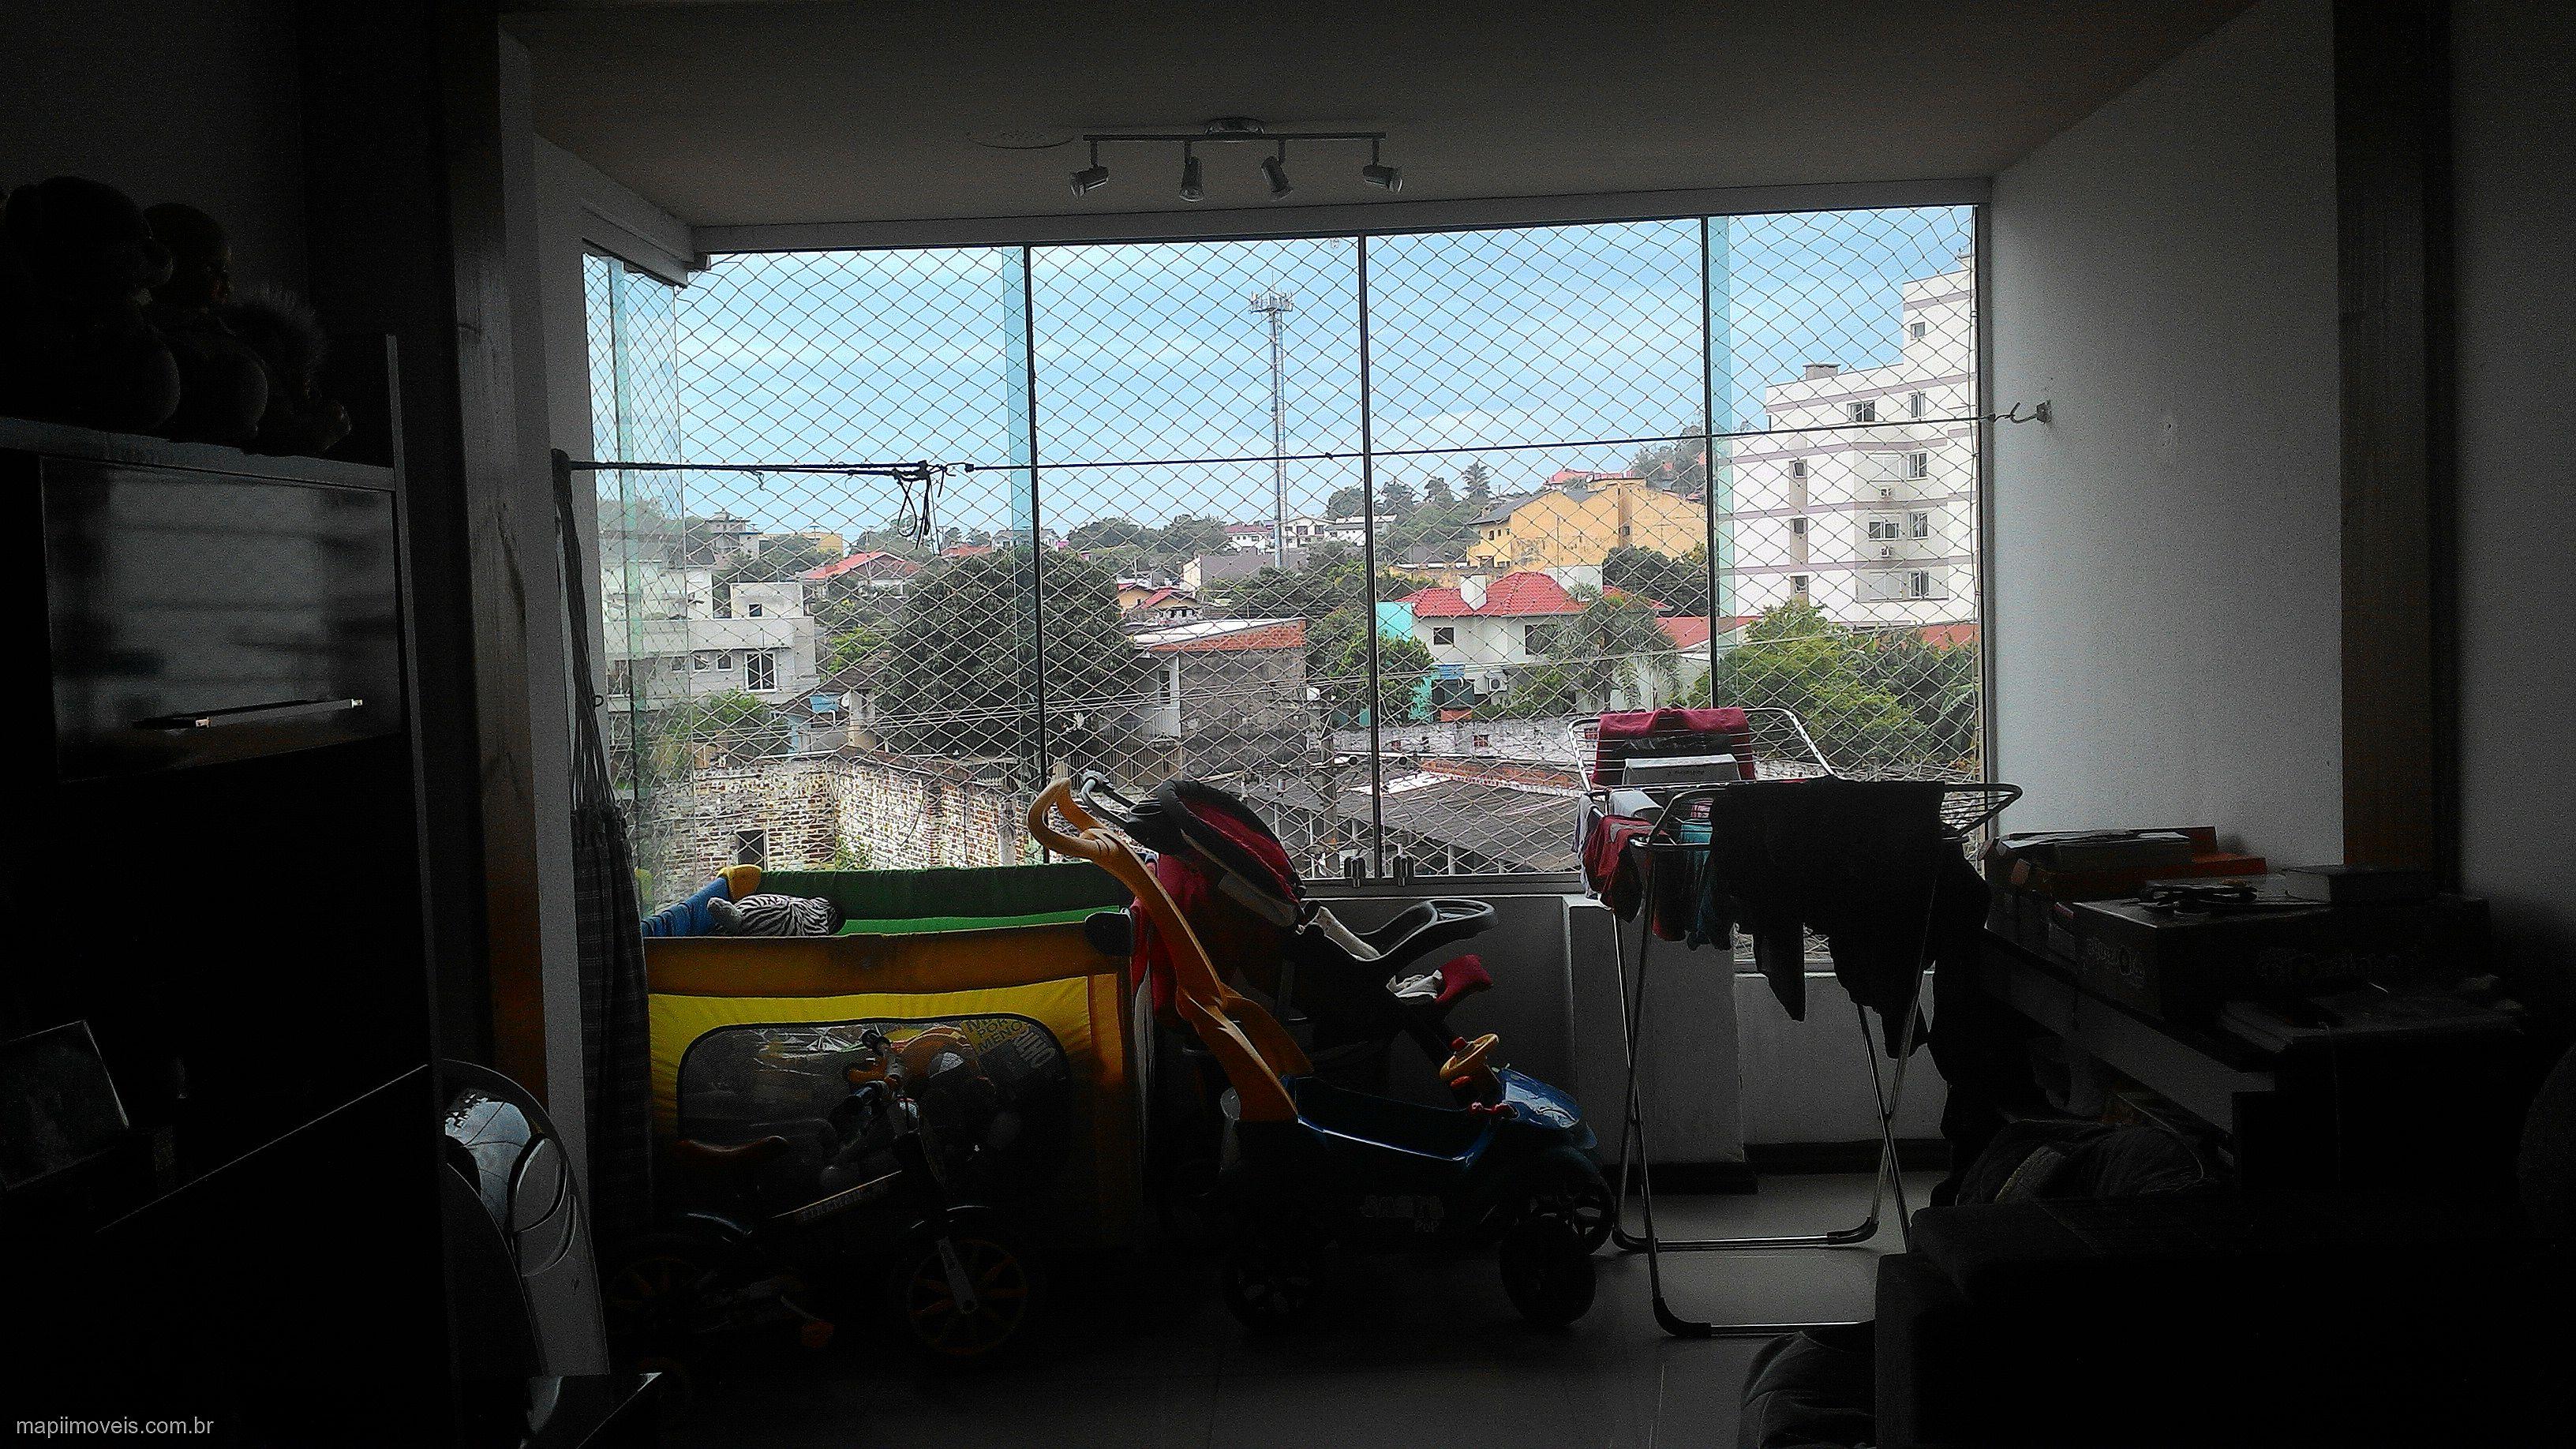 Mapi Imóveis - Apto 1 Dorm, Boa Vista (287999) - Foto 6